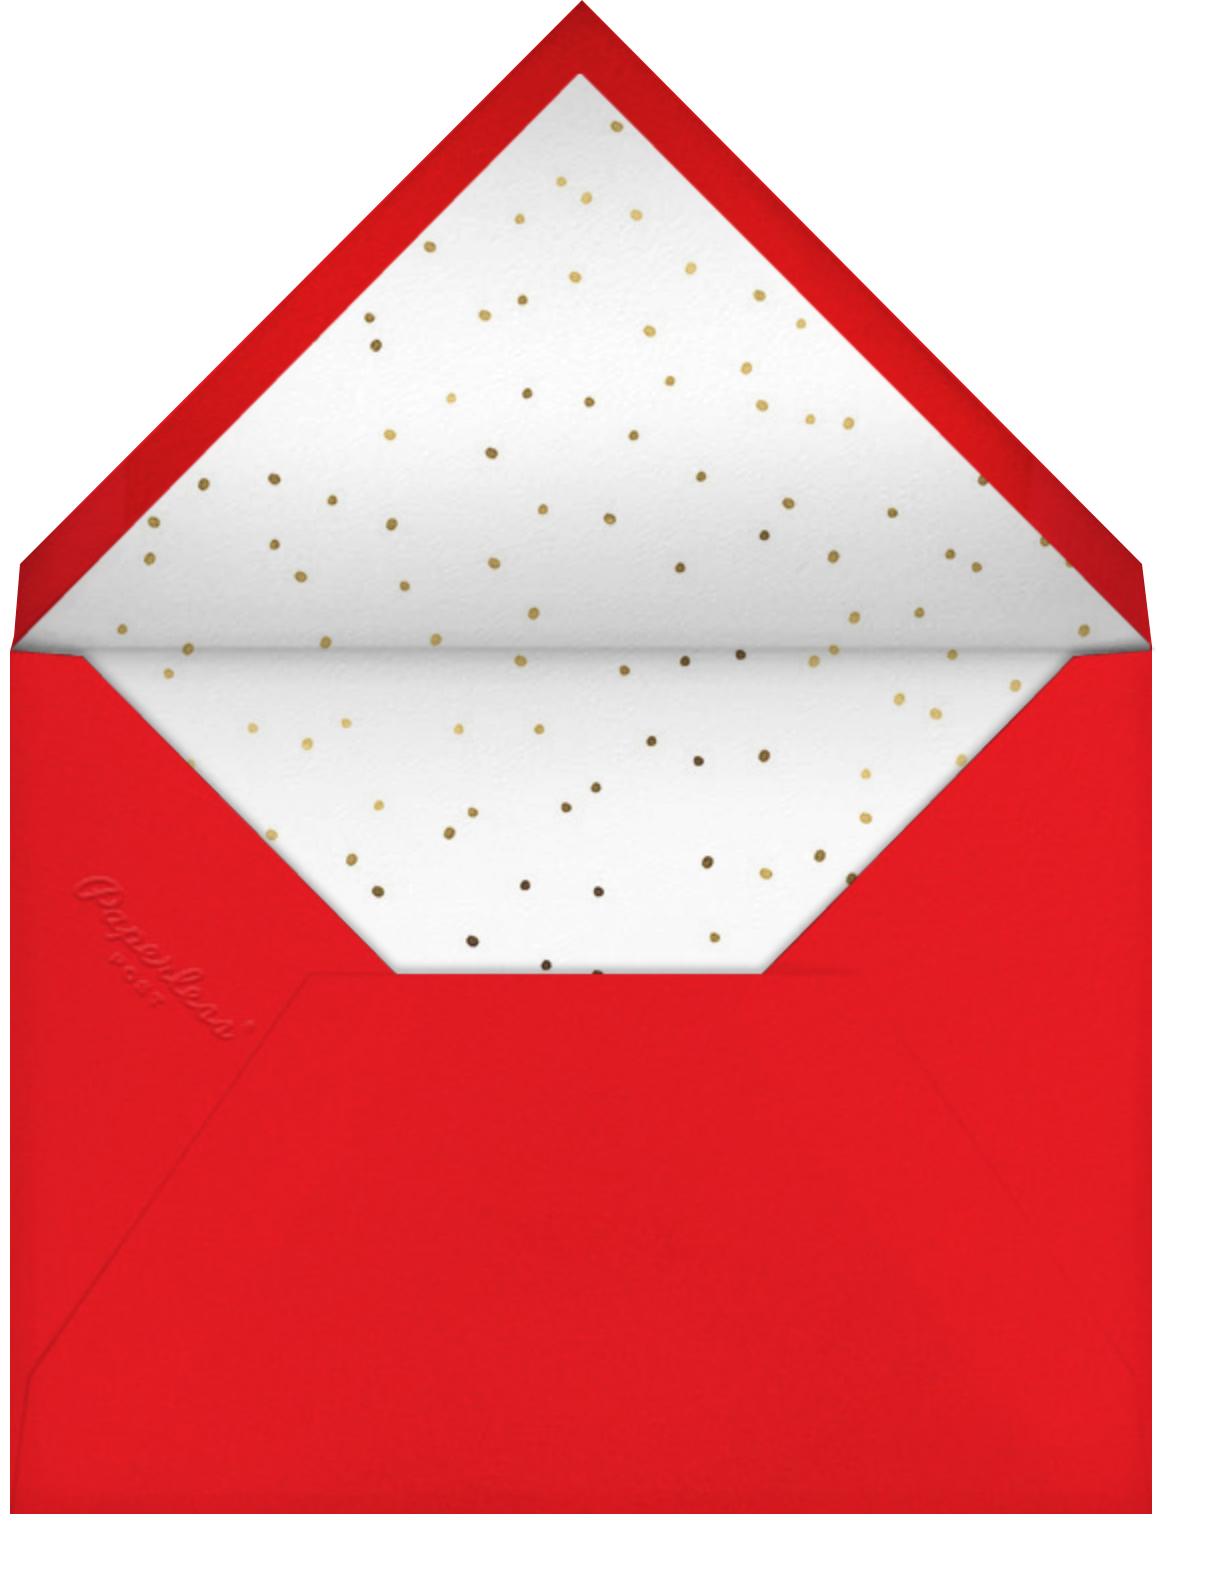 Six-Point Buck Perspective - Mr. Boddington's Studio - Holiday cards - envelope back